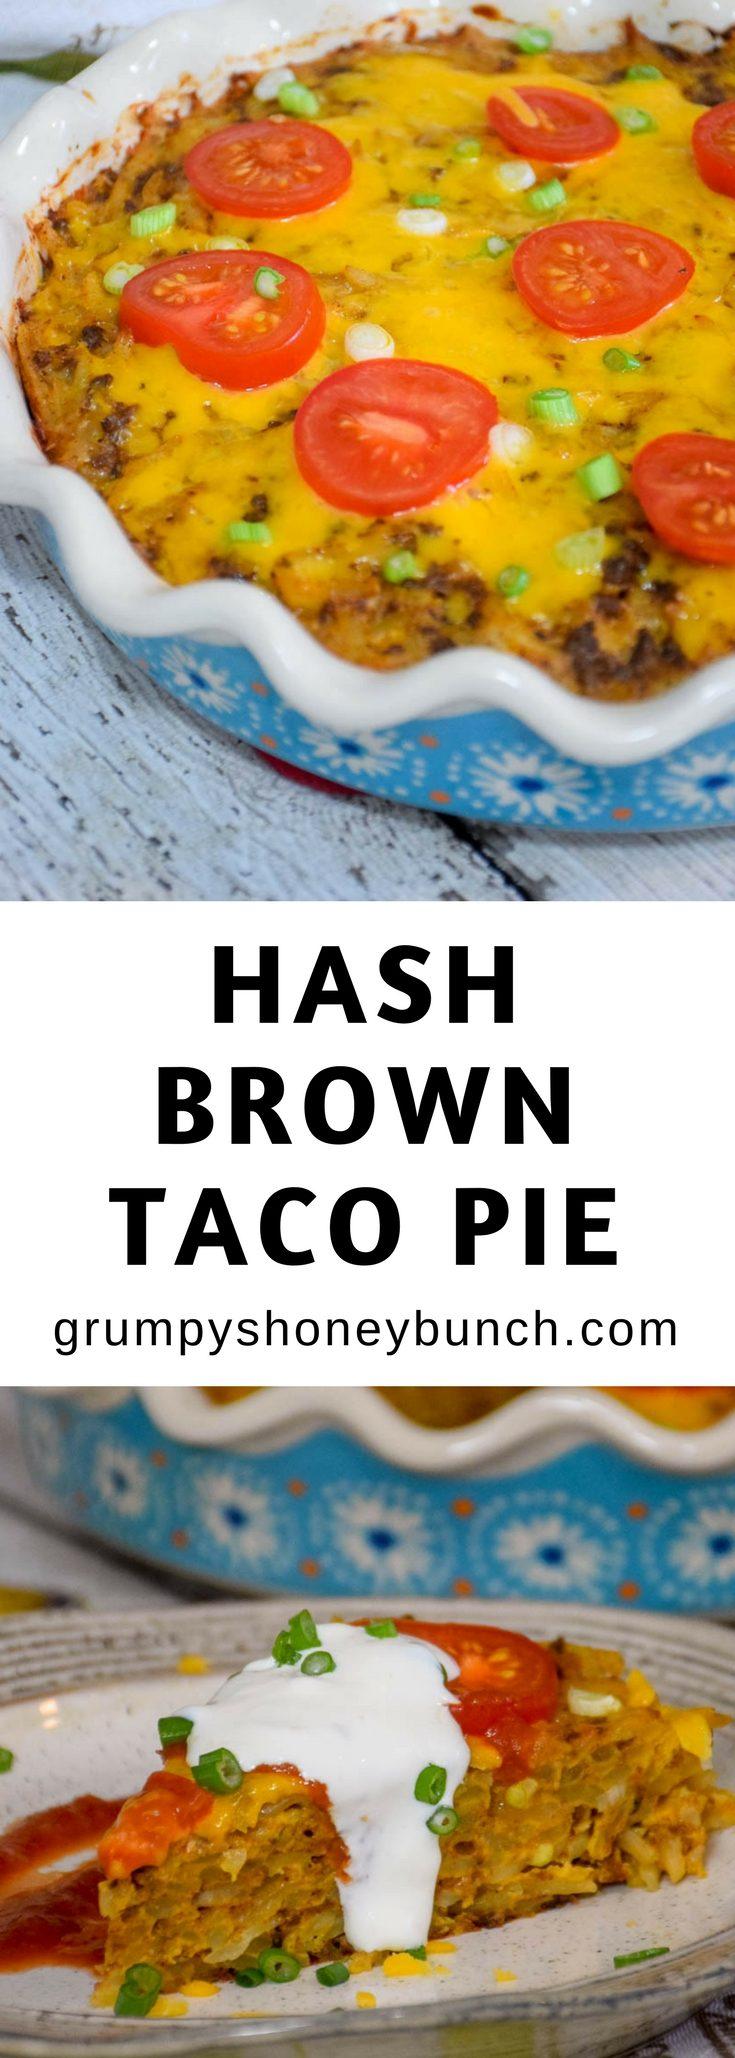 Hash Brown Taco Pie #casserole #mexican #potatoes, #taco #pie